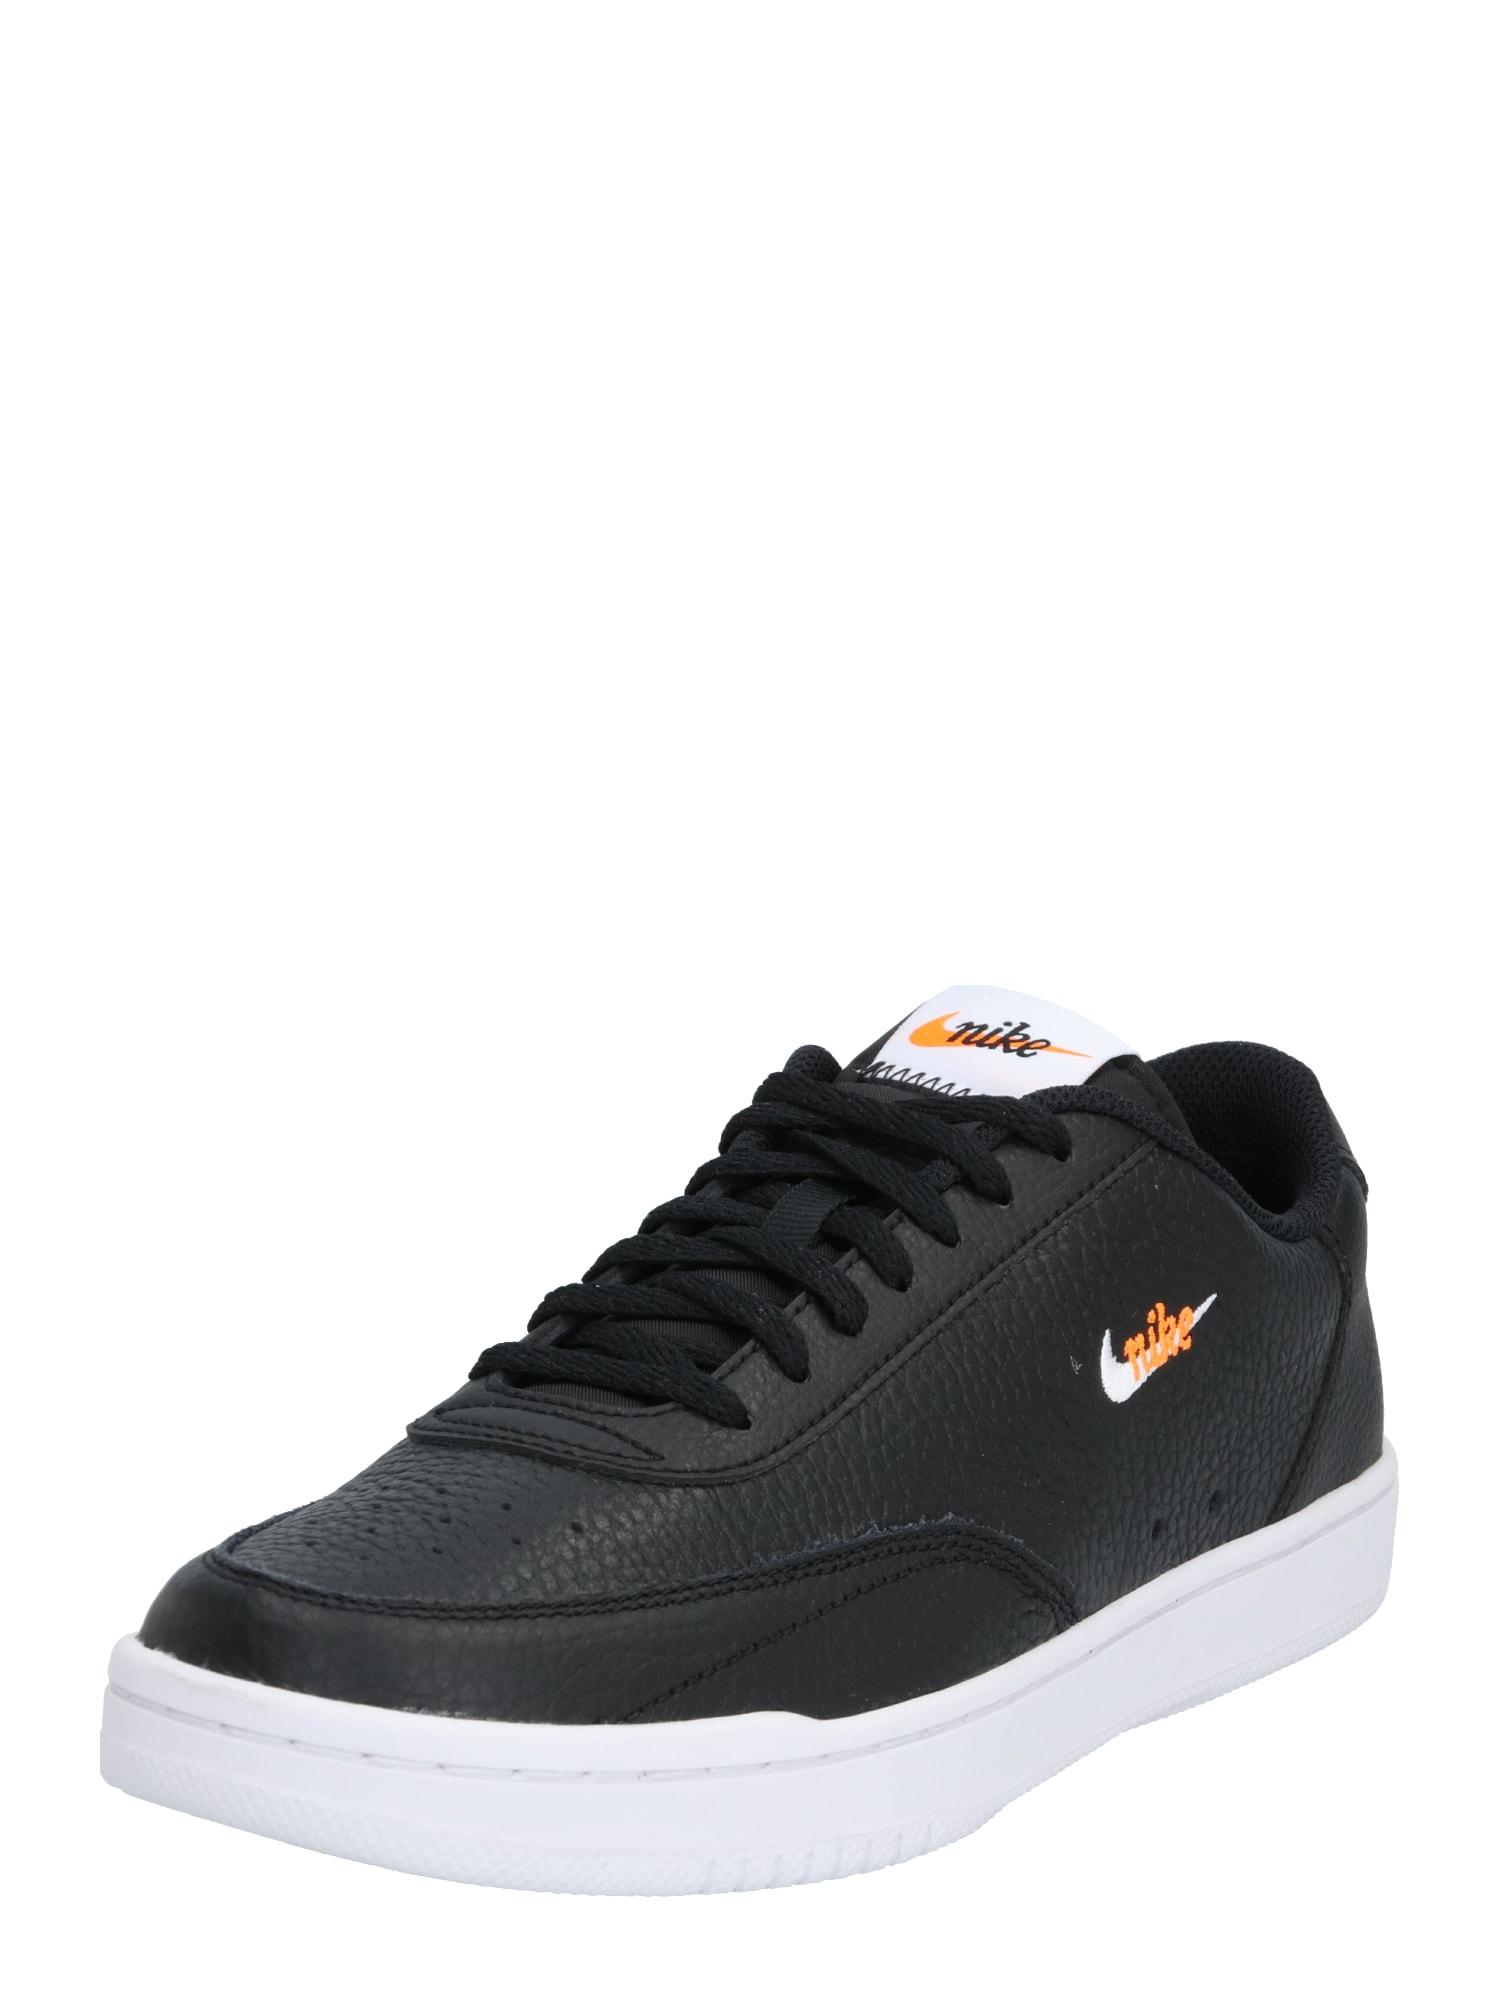 Nike Sportswear Nízke tenisky 'Court Vintage'  biela / čierna